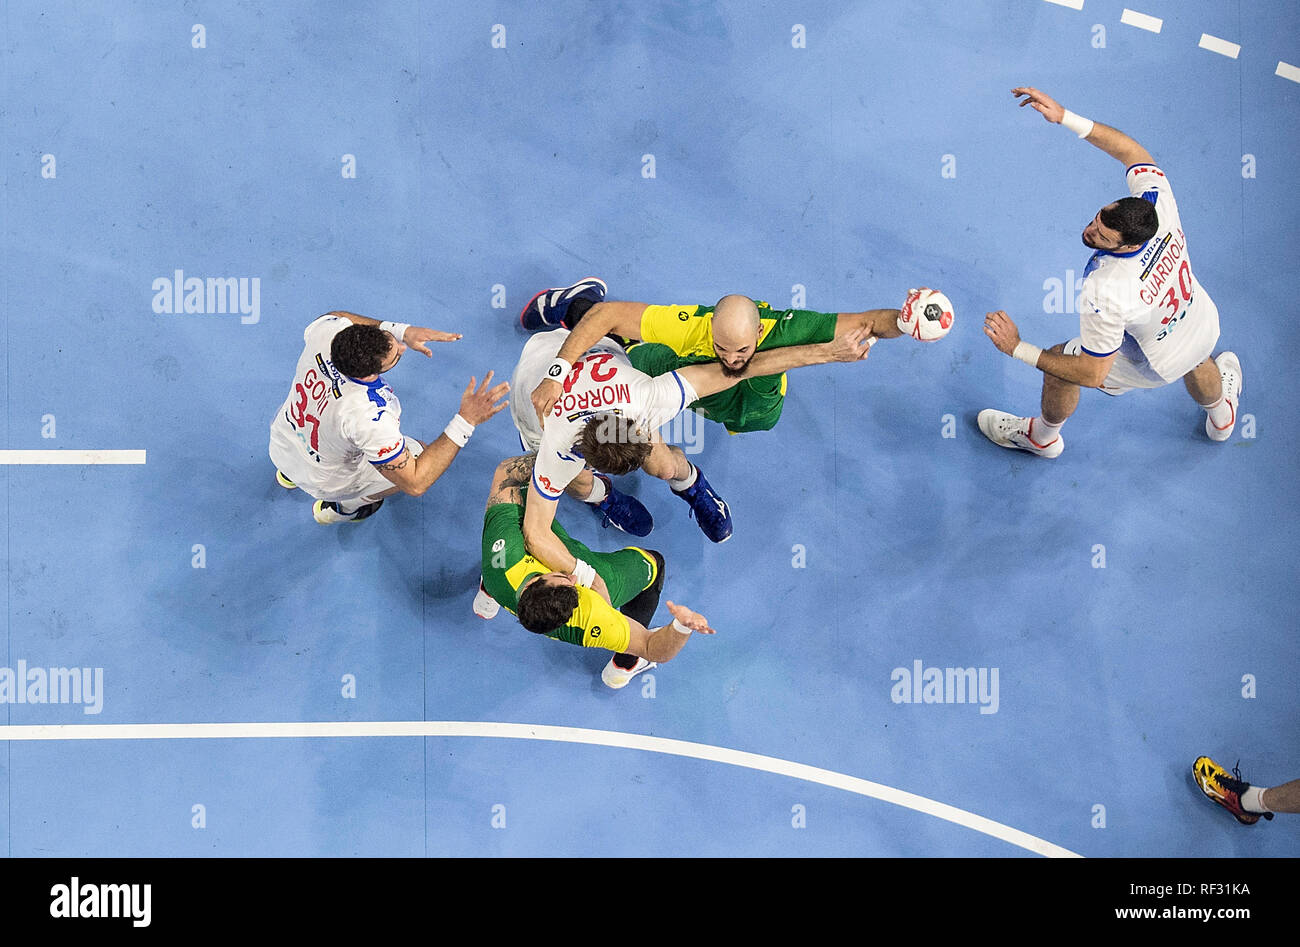 RODRIGUES Gustavo (BRA) versus left to right GONI LEOZ Iosu (ESP), Viran MORROS (ESP), Gedeon GUARDIOLA (ESP), Action, Bird's eye view. Main round Group I, Spain (ESP) - Brazil (BRA) 36:24, on 21.01.2019 in Koeln / Germany. Handball World Cup 2019, from 10.01. - 27.01.2019 in Germany / Denmark. | usage worldwide Stock Photo